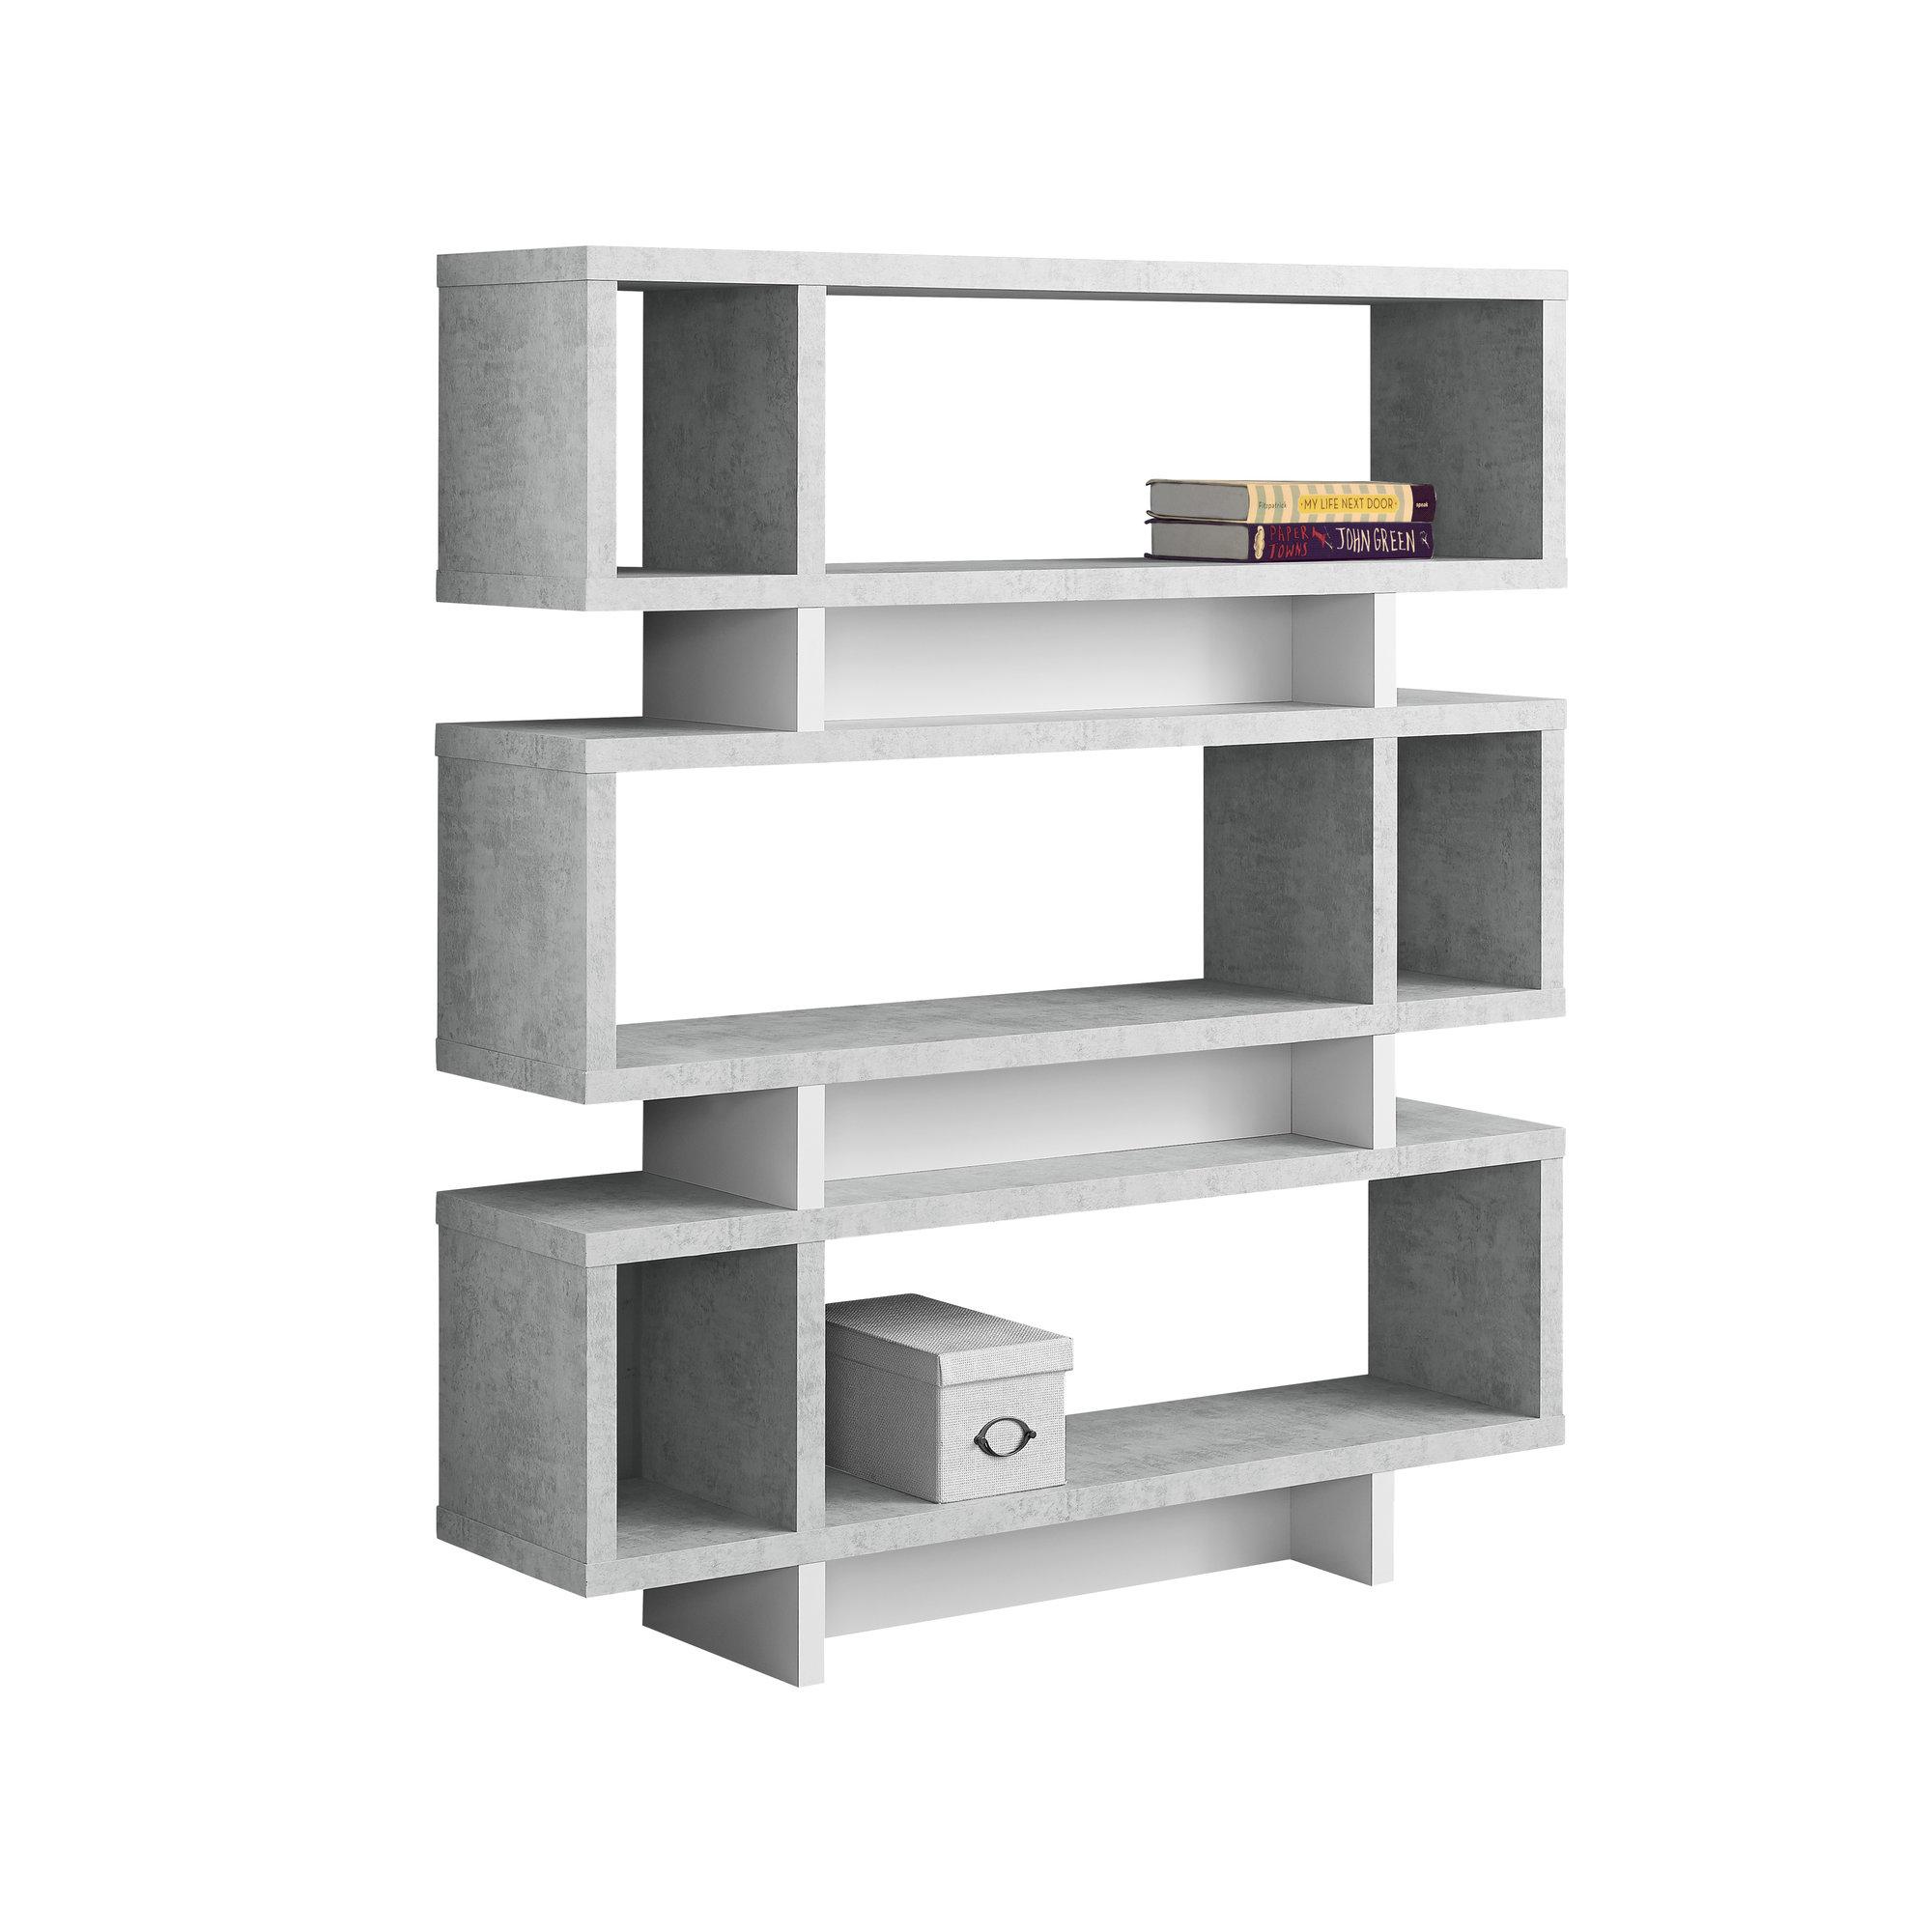 "12"" x 47.25"" x 54.75"" Grey White Particle Board Hollow Core  Bookcase"